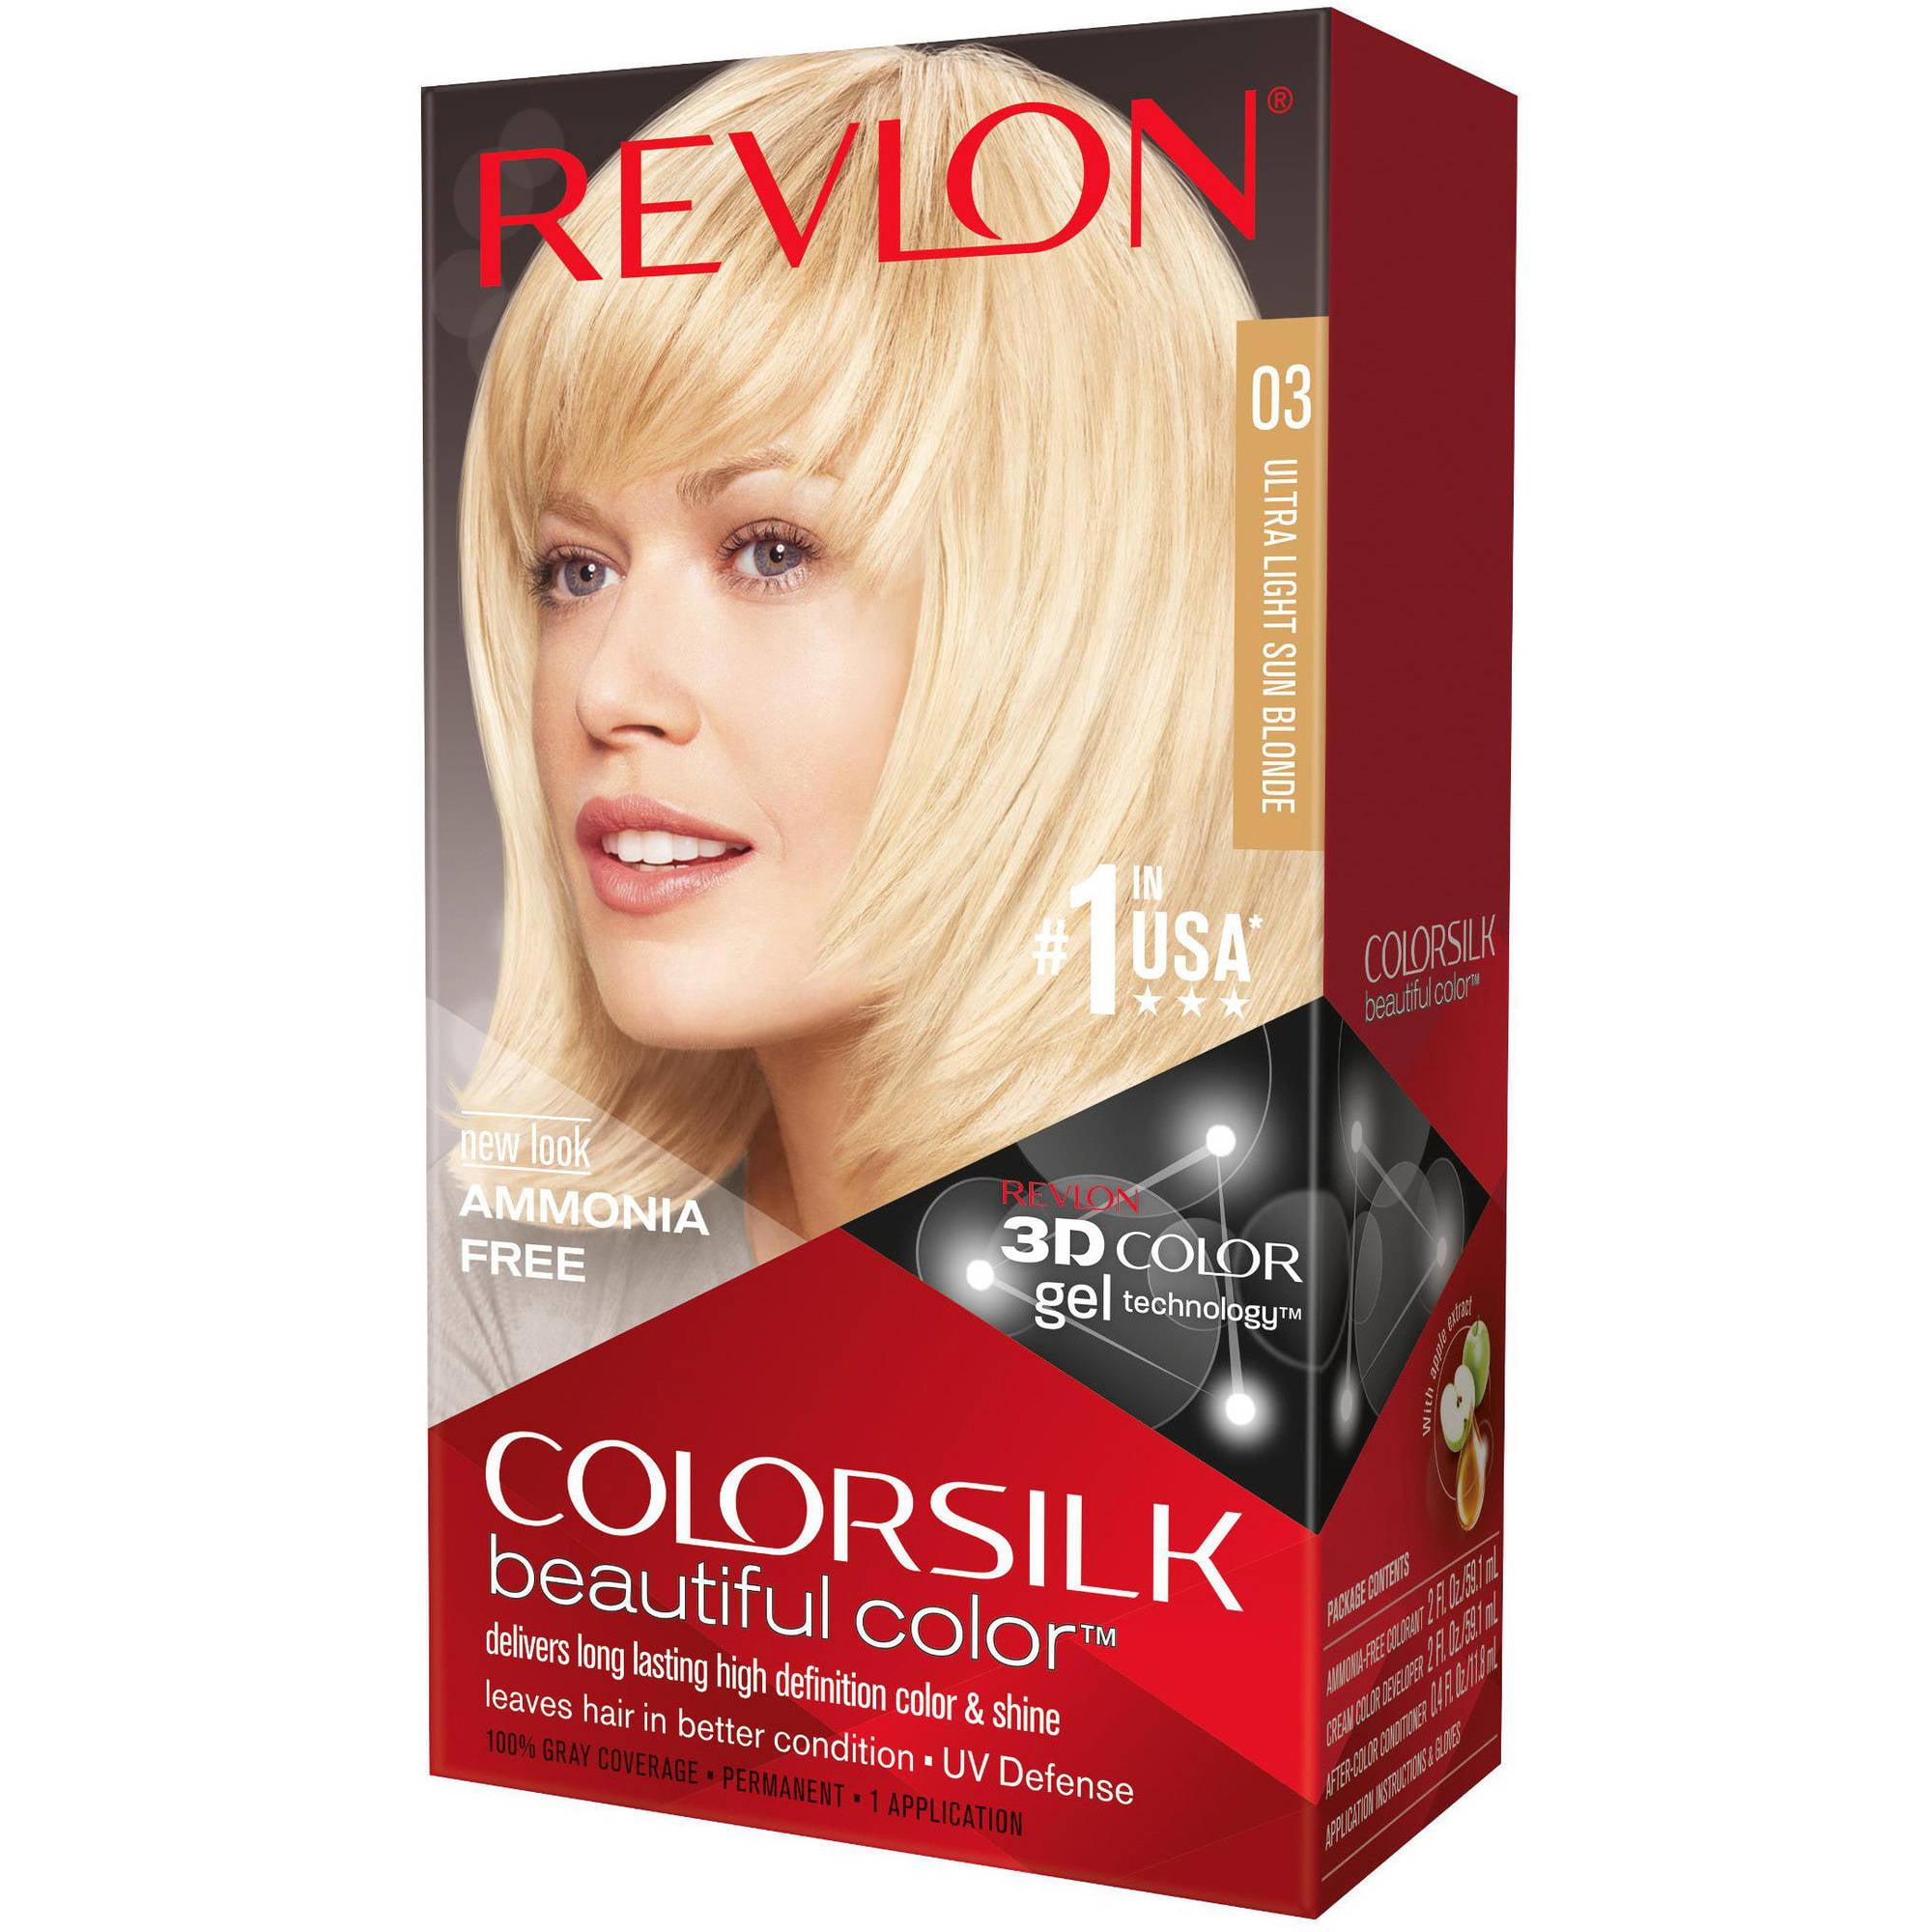 Revlon Colorsilk Beautiful Color Permanent Hair Color, 03 Ultra Light Sun Blonde